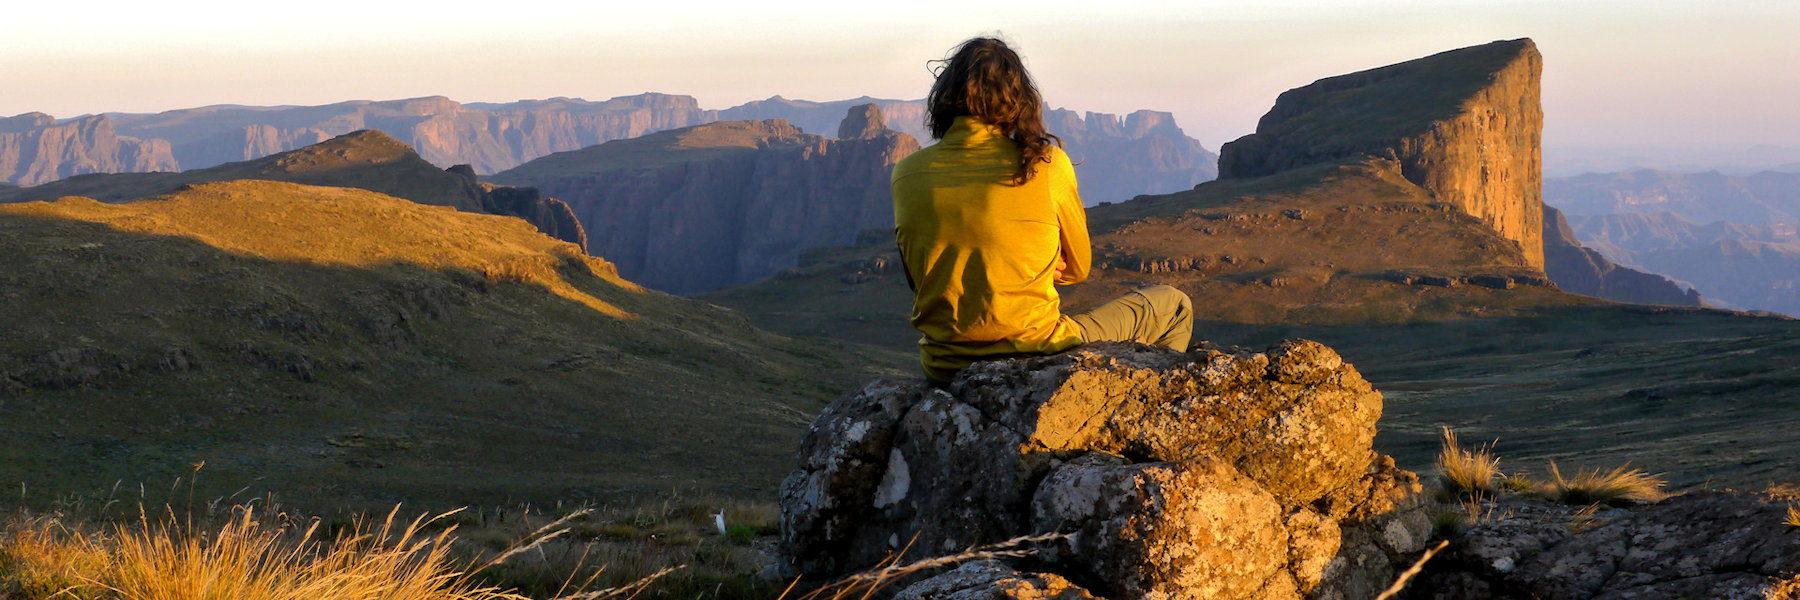 lever de soleil sur North Peak - drakensberg